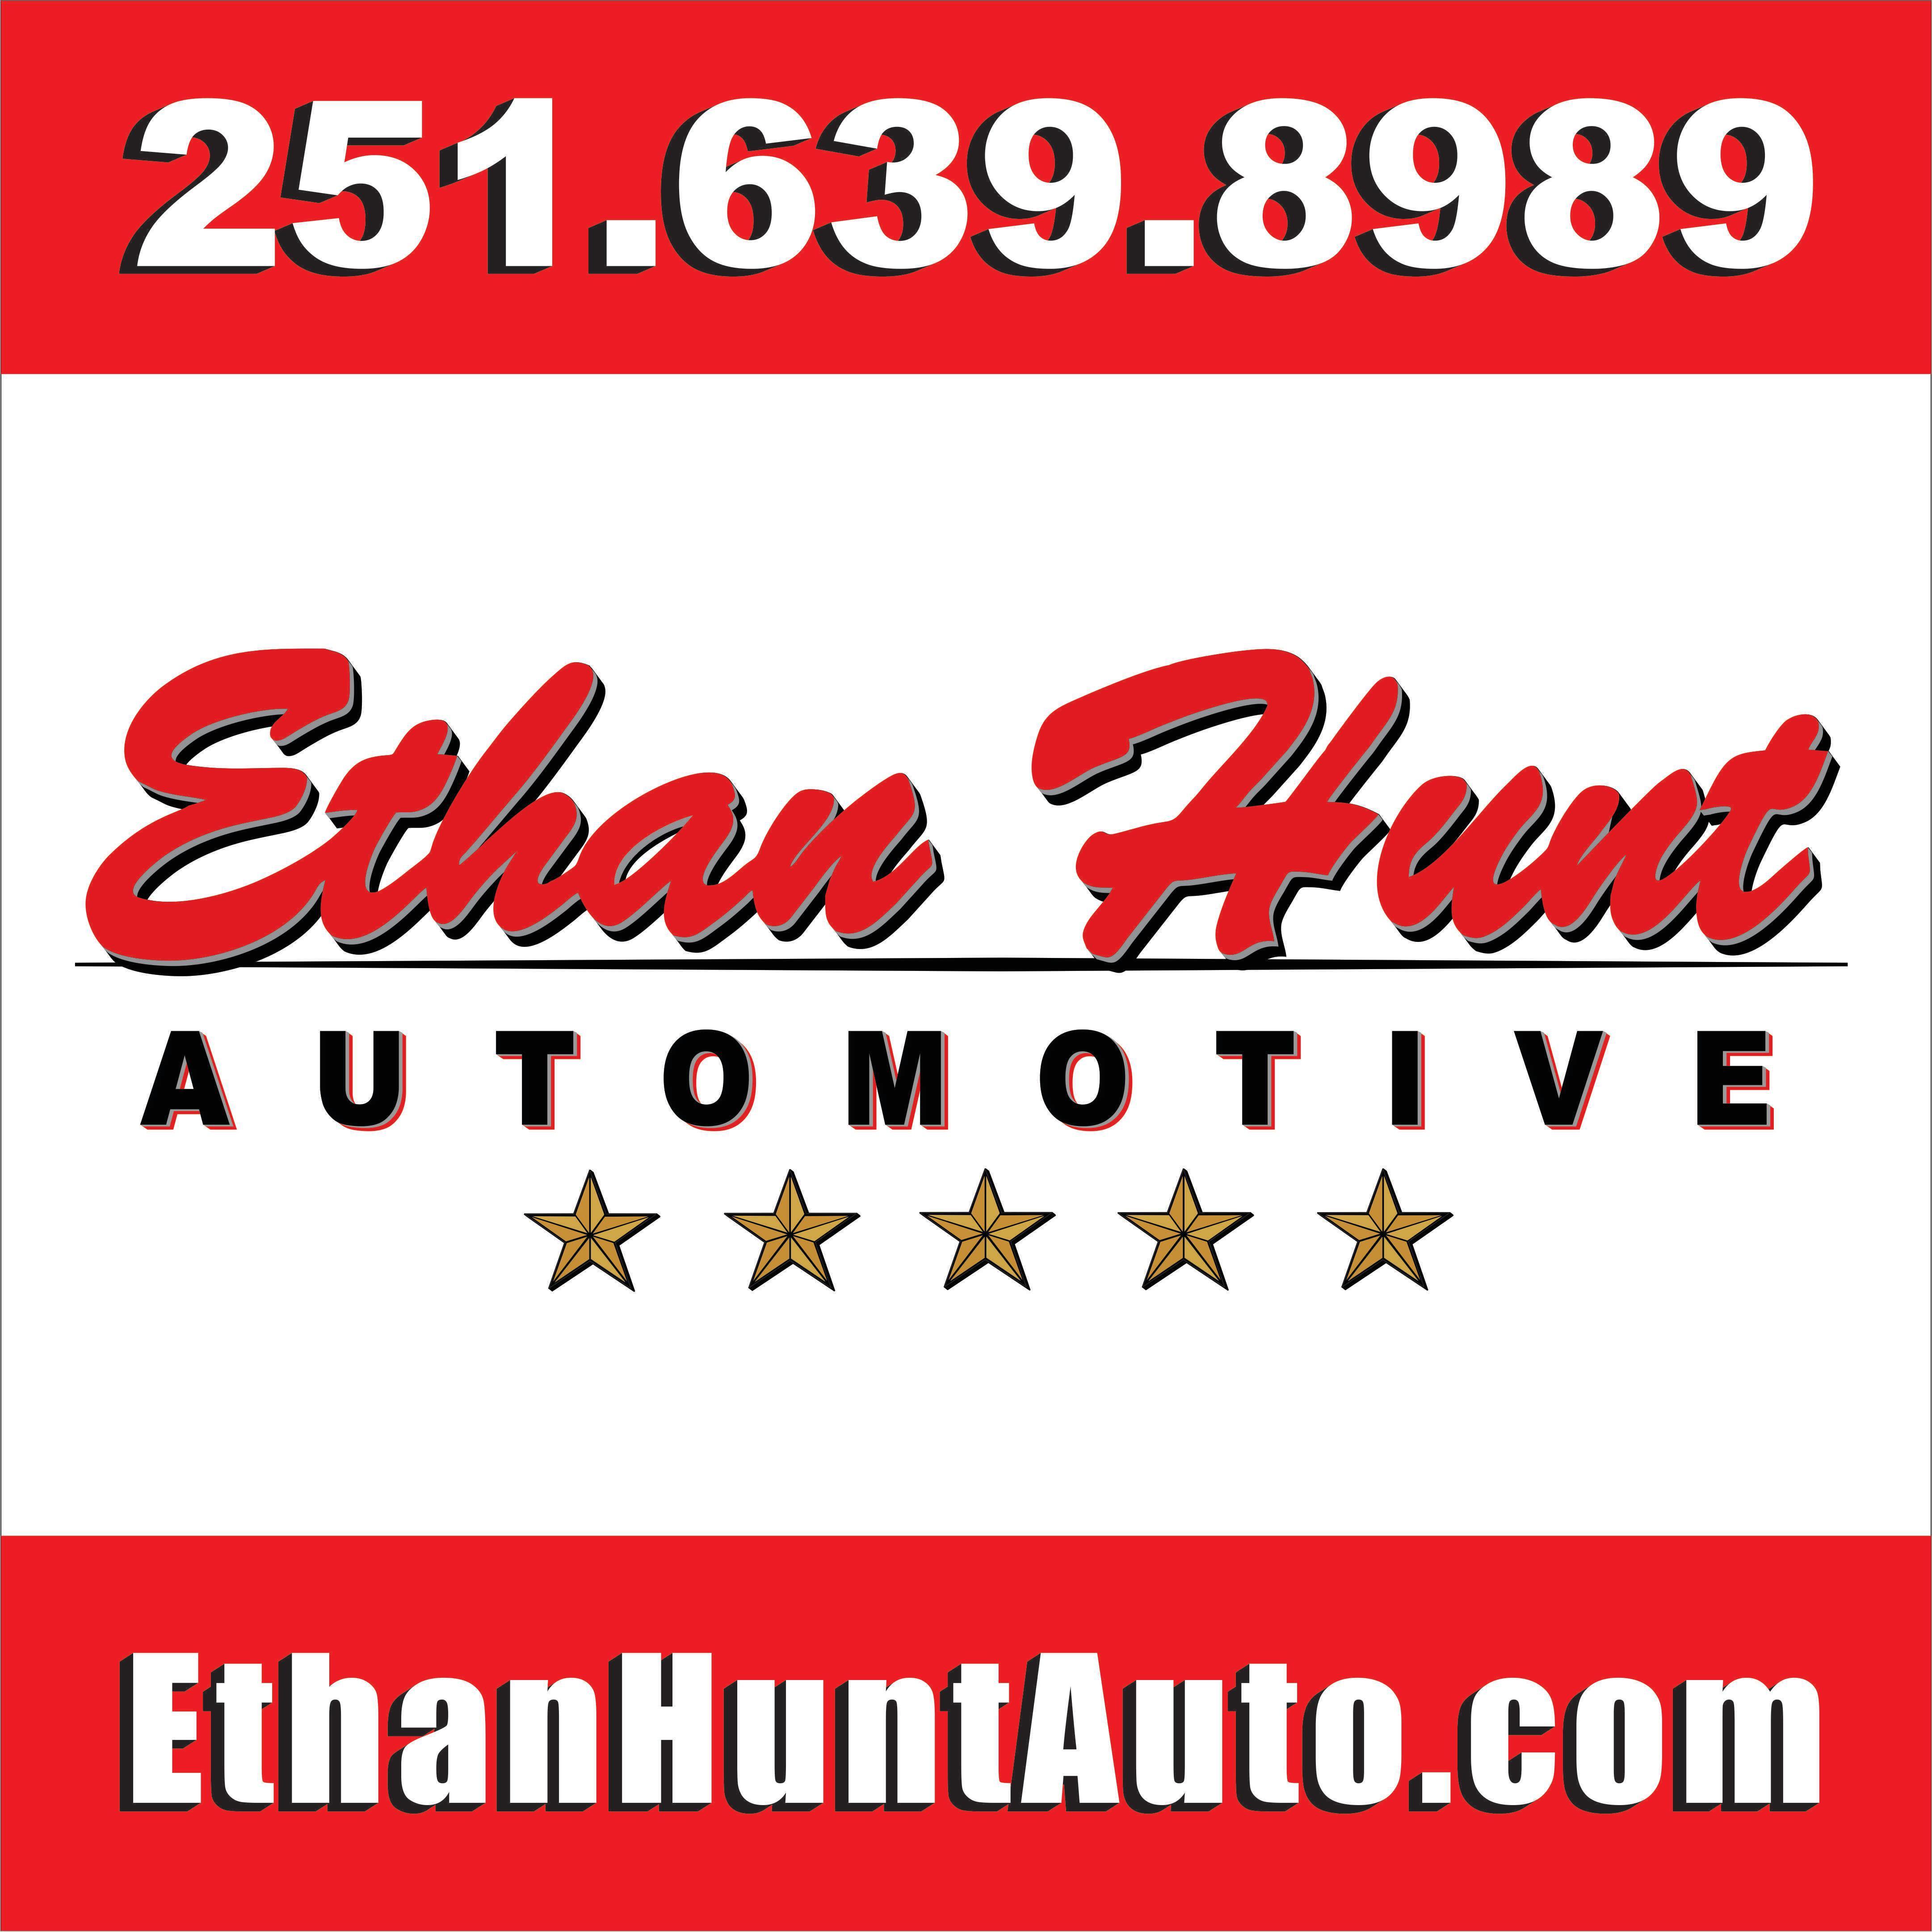 Ford Dealership Montgomery Al >> Ethan Hunt Automotive - Mobile, AL - Company Profile